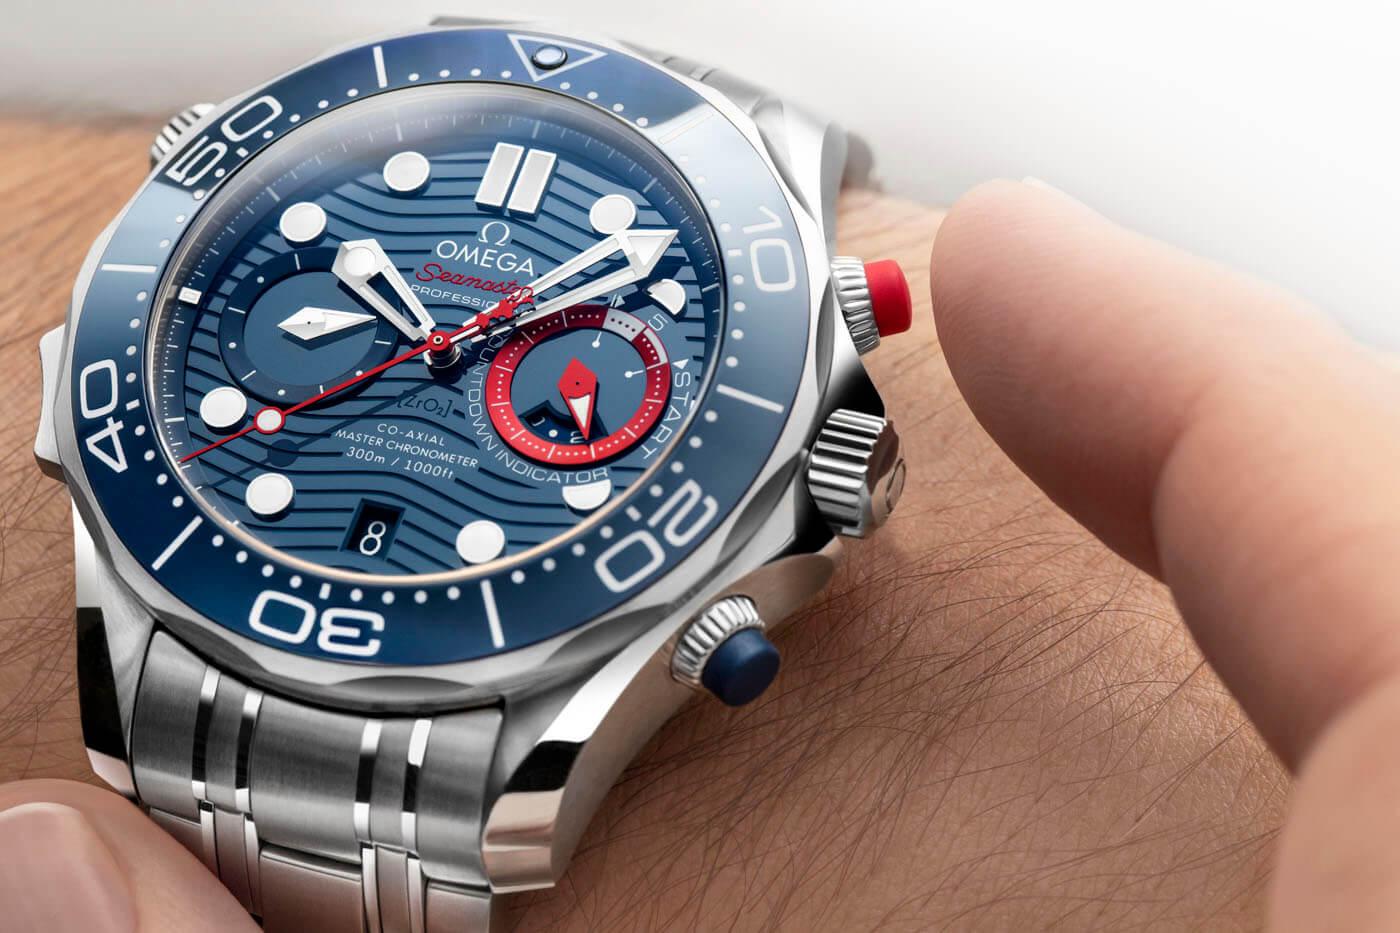 omega Seamaster Diver 300M America's Cup Chronograph portada